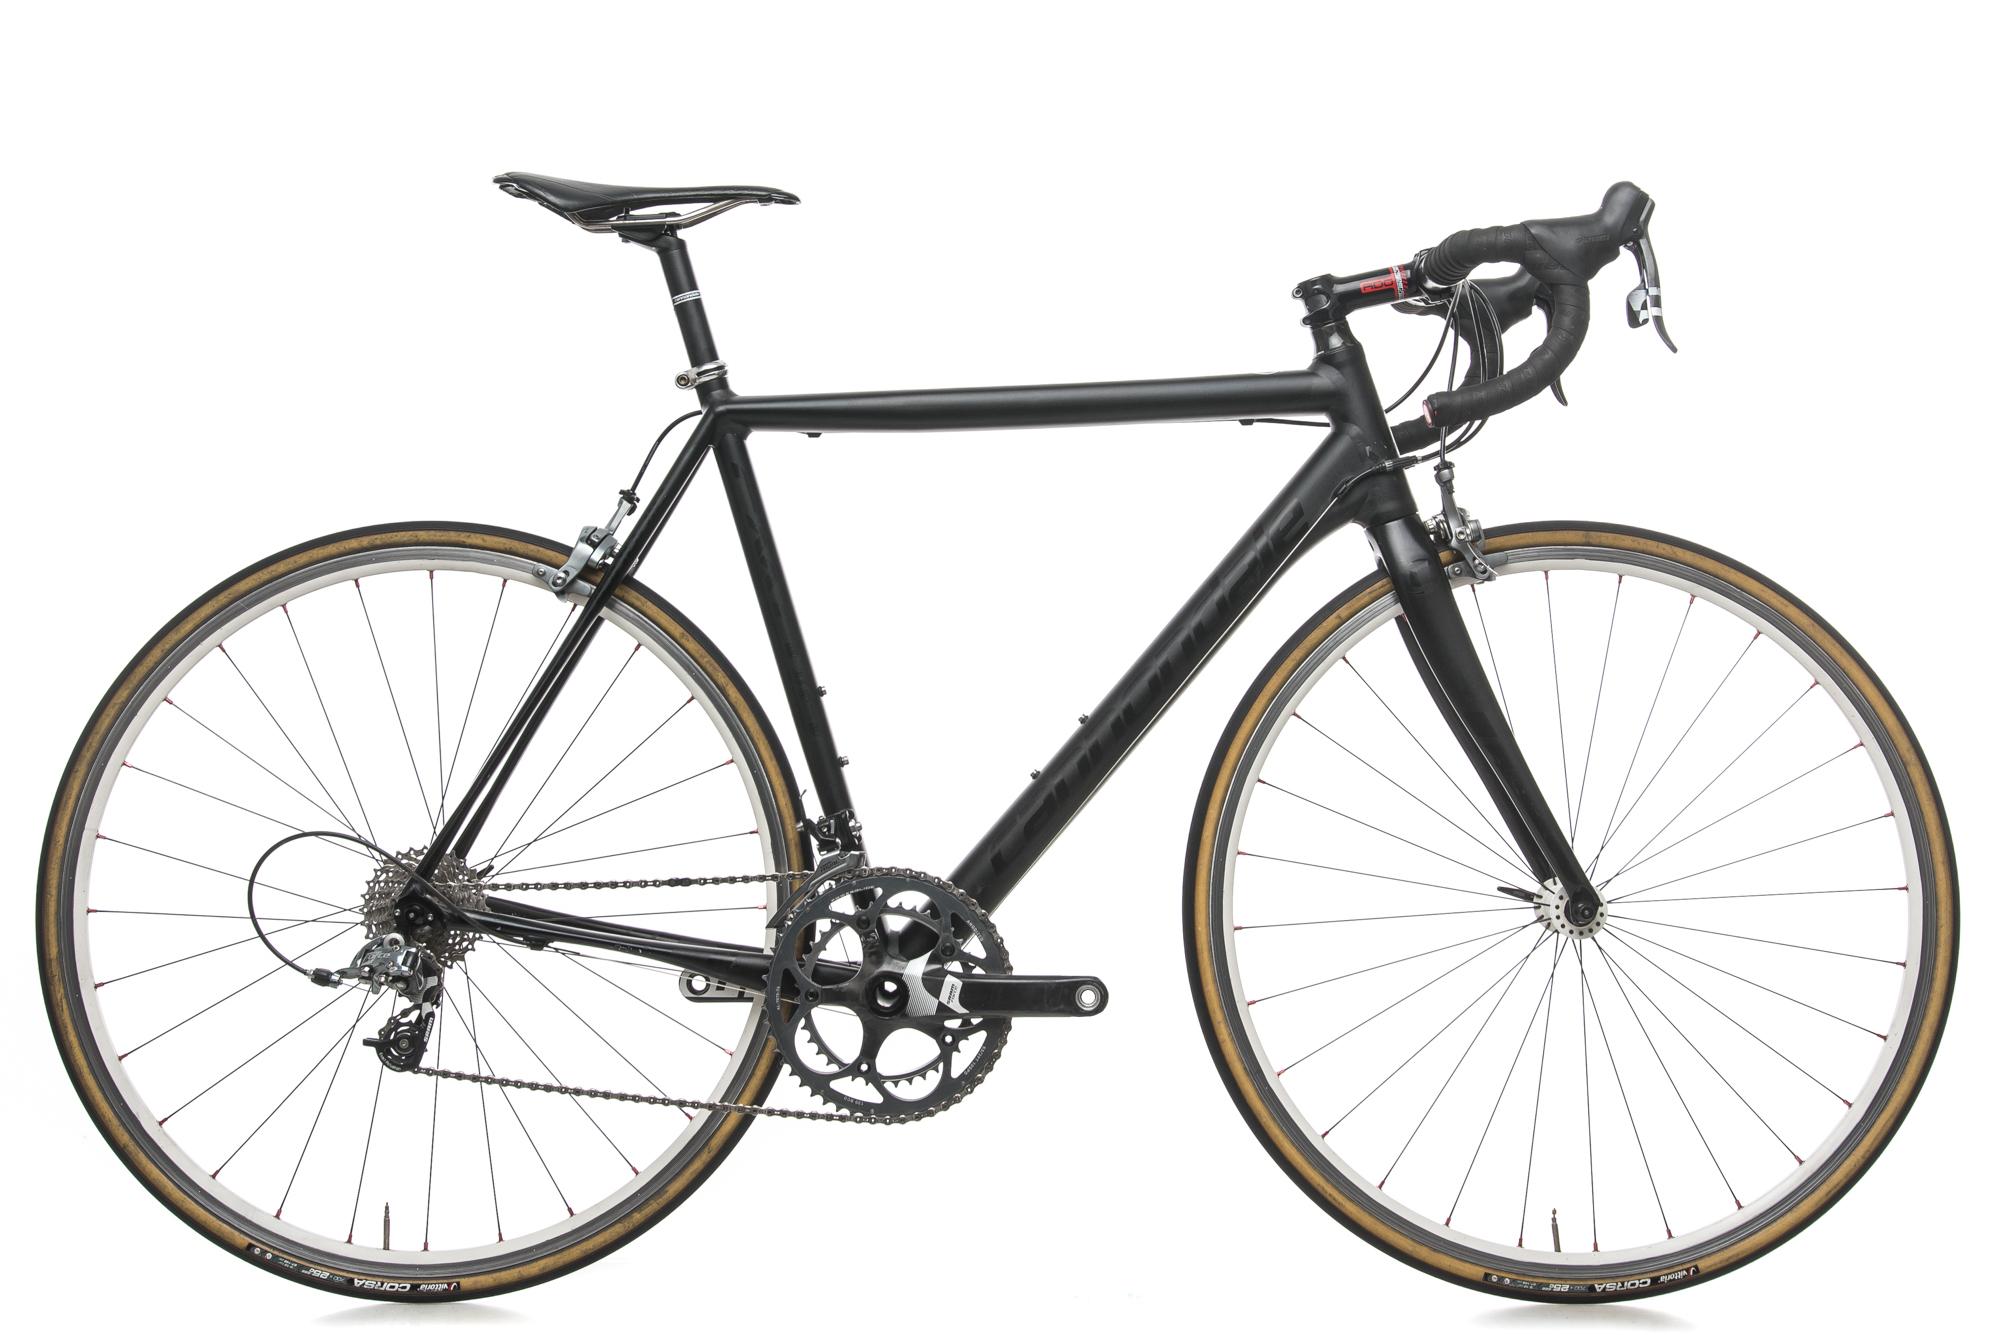 2014 Cannondale CAAD10 Road Bike 56cm Large Aluminum SRAM Force ...